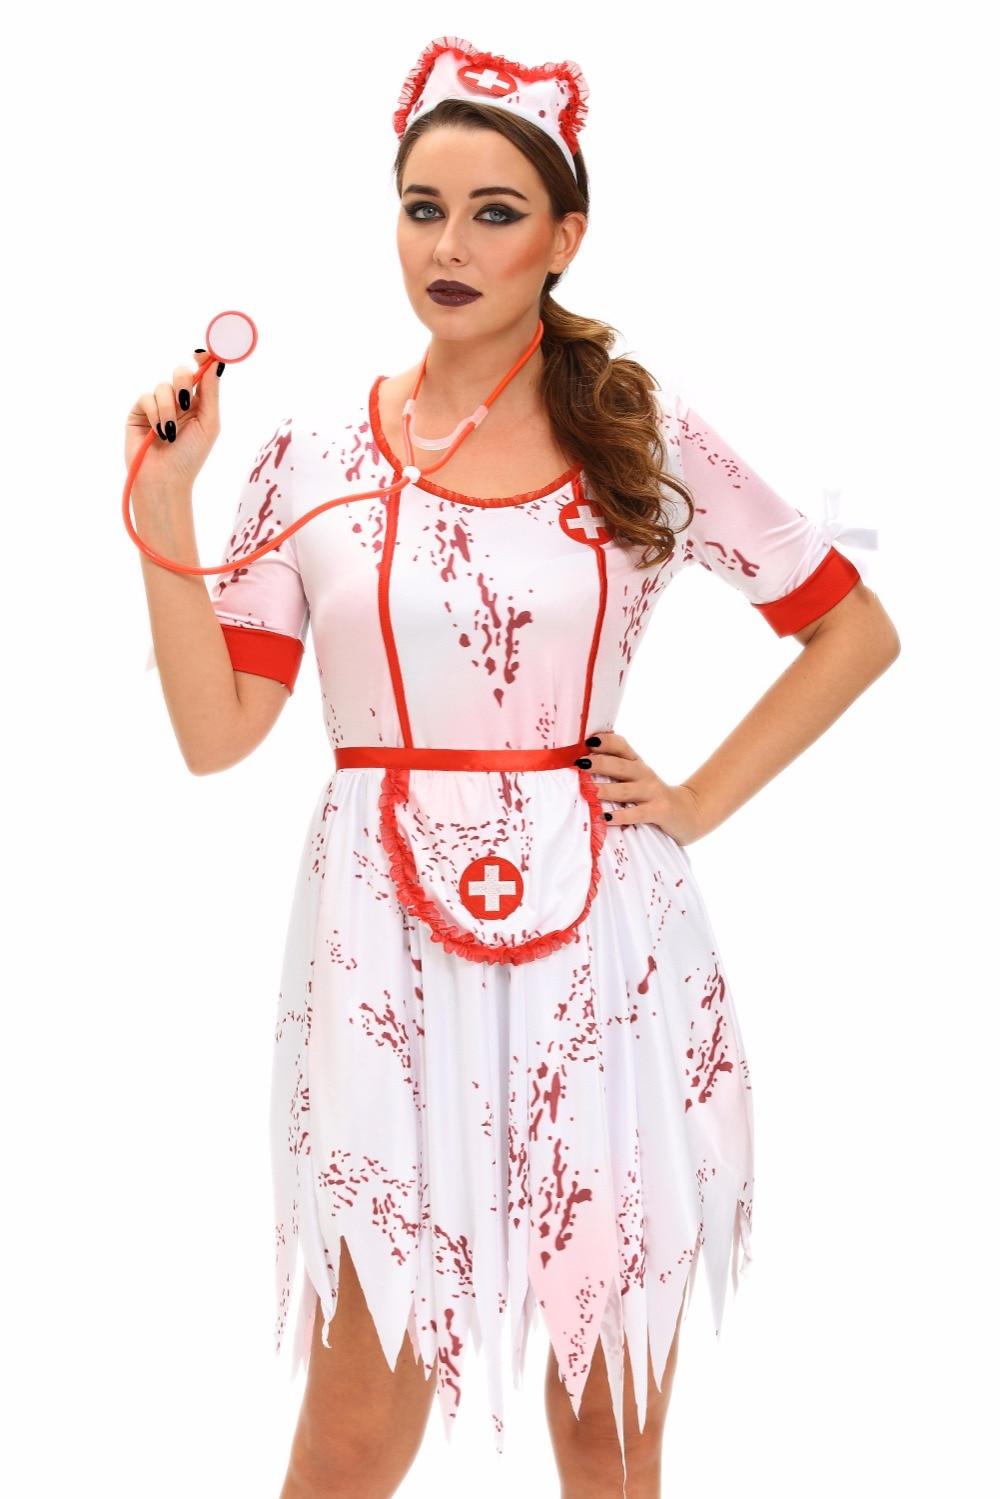 2017 halloween costumes 3pcs horrible zombie nurse costume women naughty sexy nurse costumes nursing uniforms lc8967 - Naughty Halloween